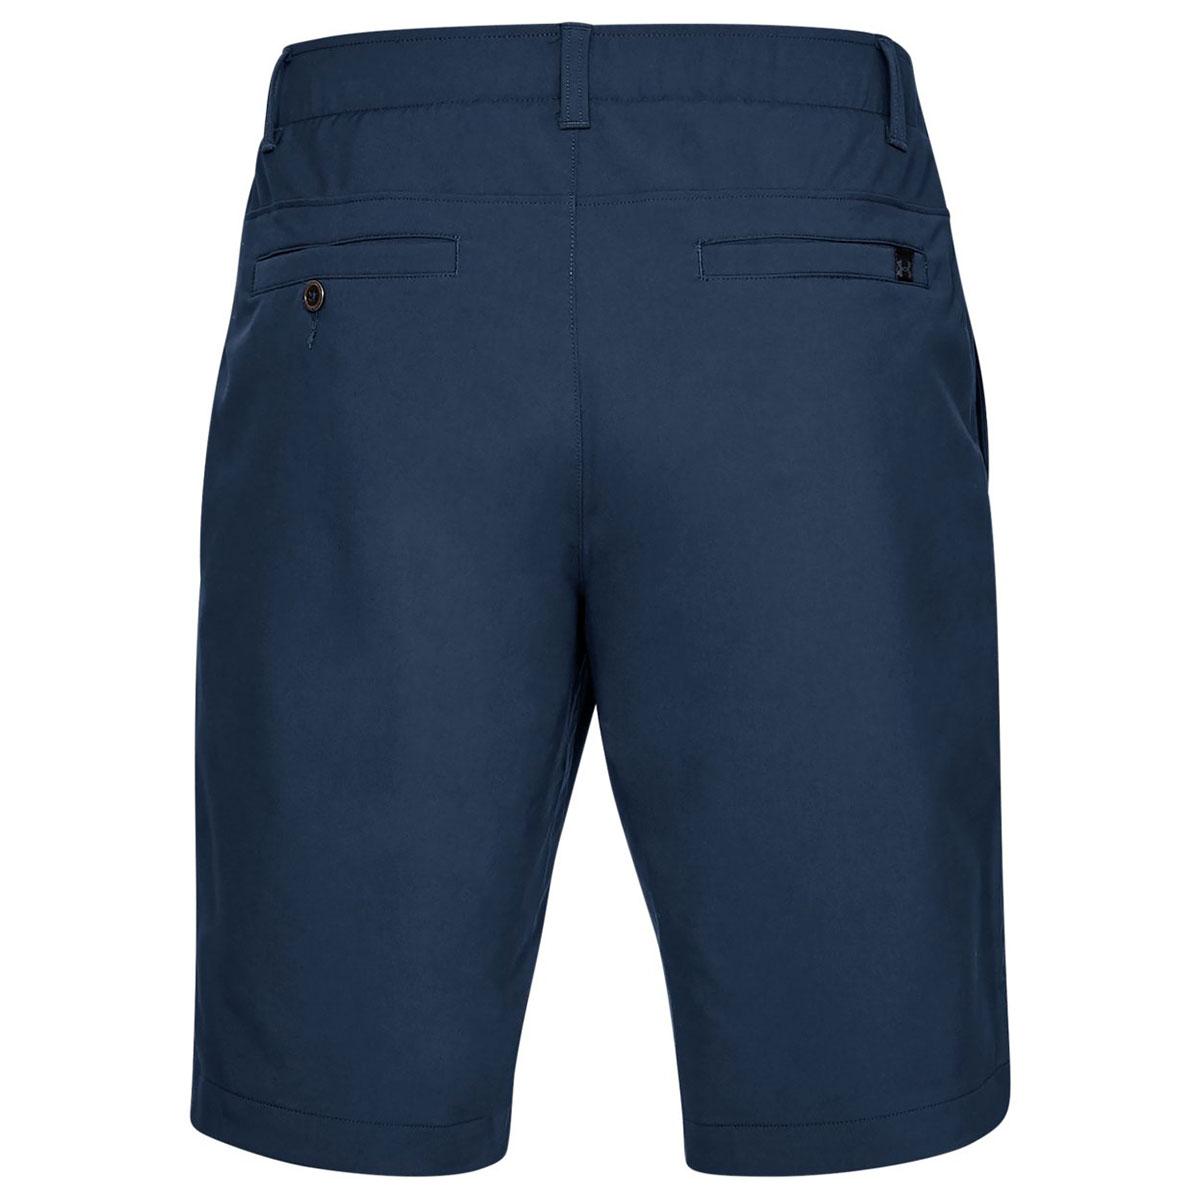 Under-Armour-Mens-2019-EU-Performance-Taper-Stretch-Soft-Comfort-Golf-Shorts thumbnail 3